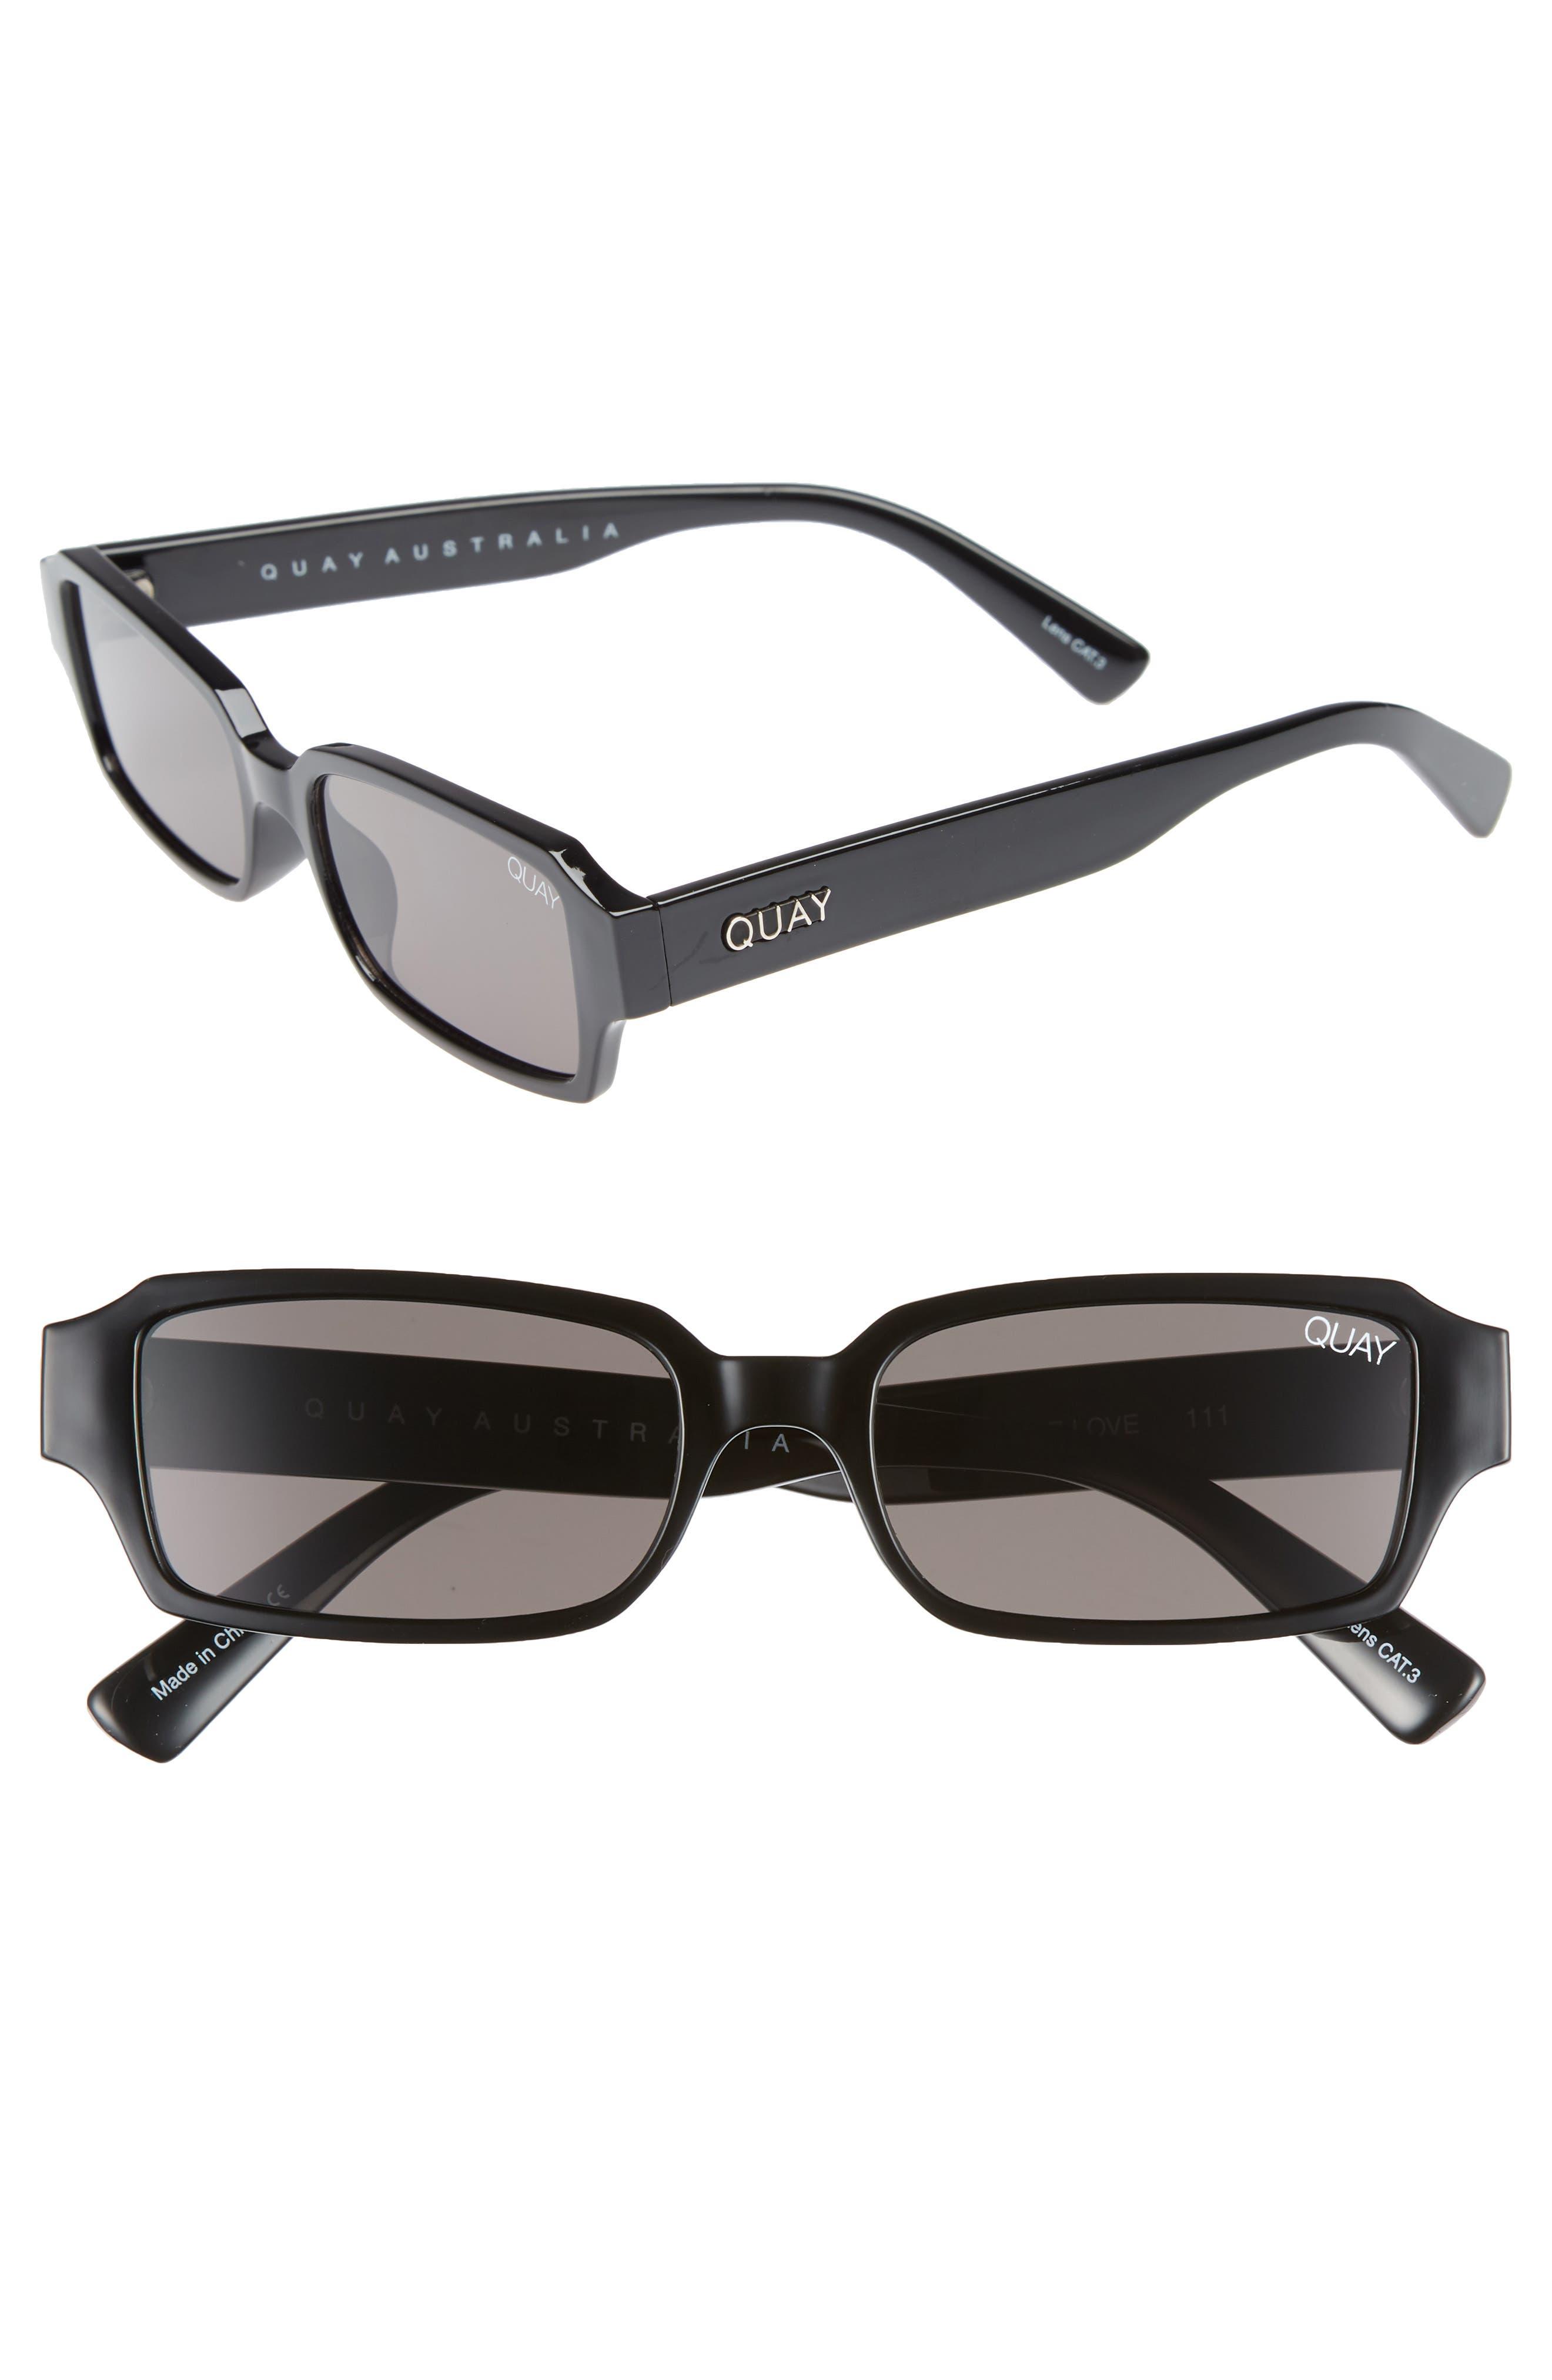 Strange Love 53mm Rectangle Sunglasses,                         Main,                         color, BLACK/ SMOKE